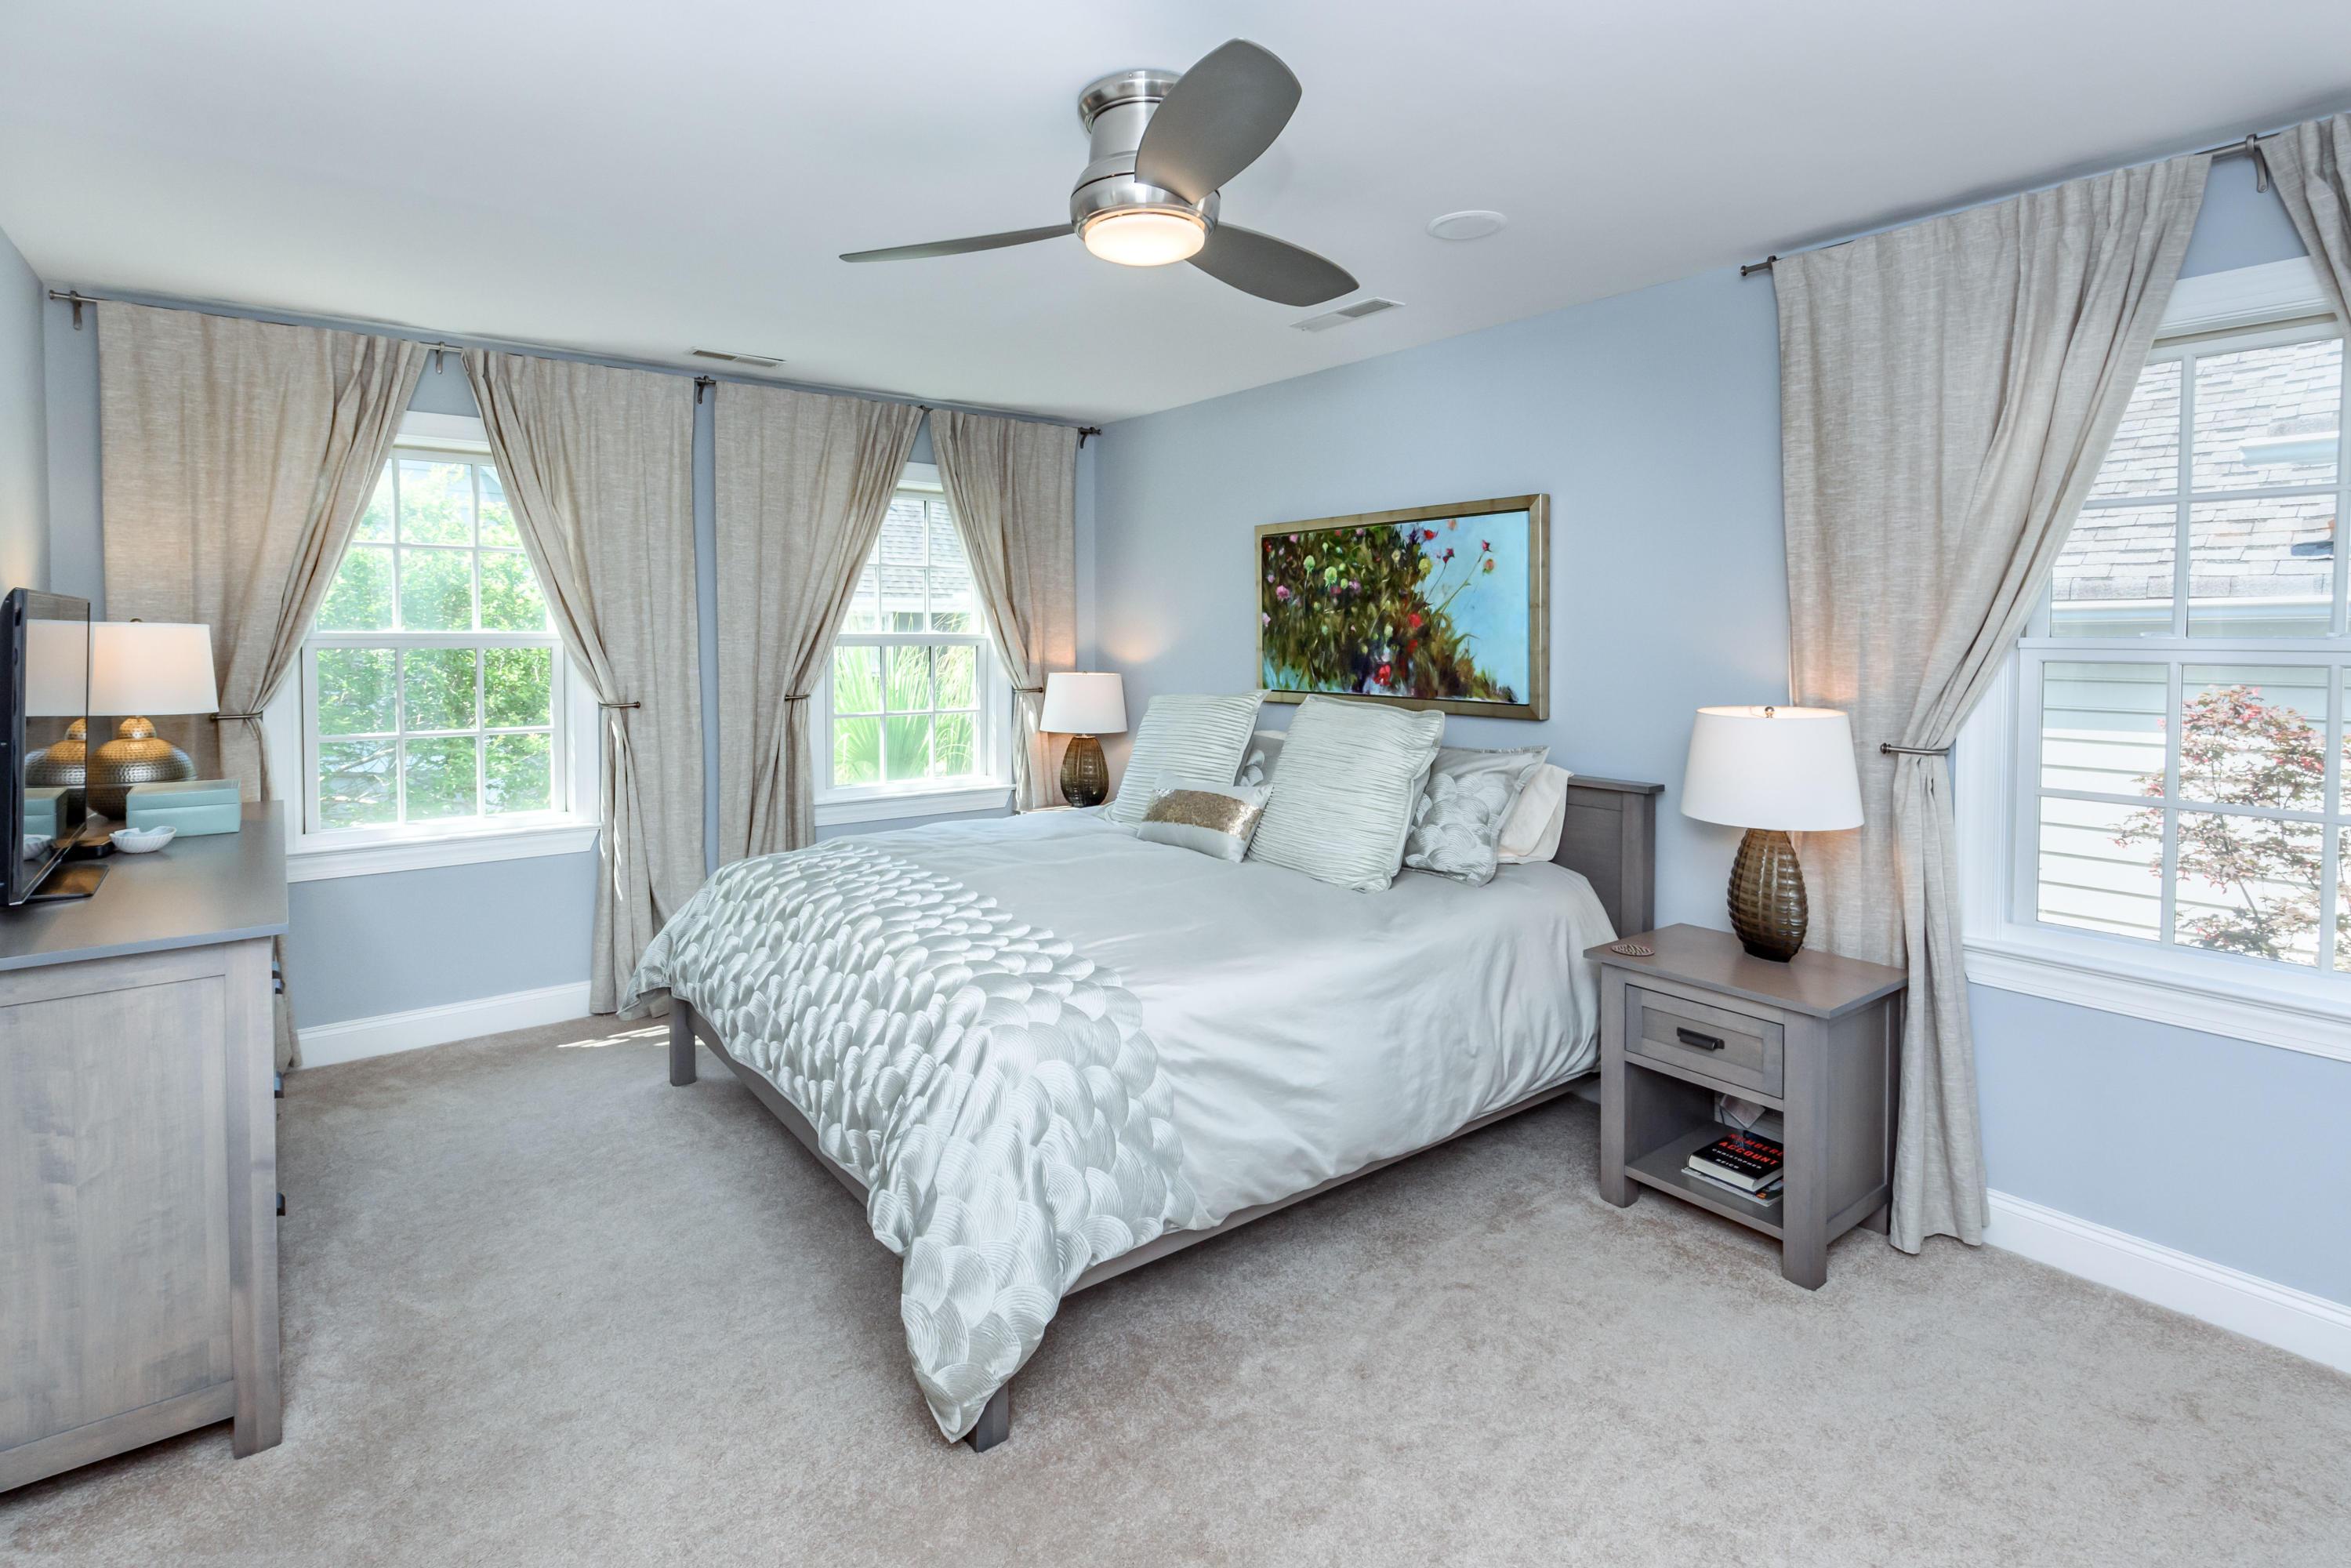 Harleston Place Homes For Sale - 32 Harleston, Charleston, SC - 11